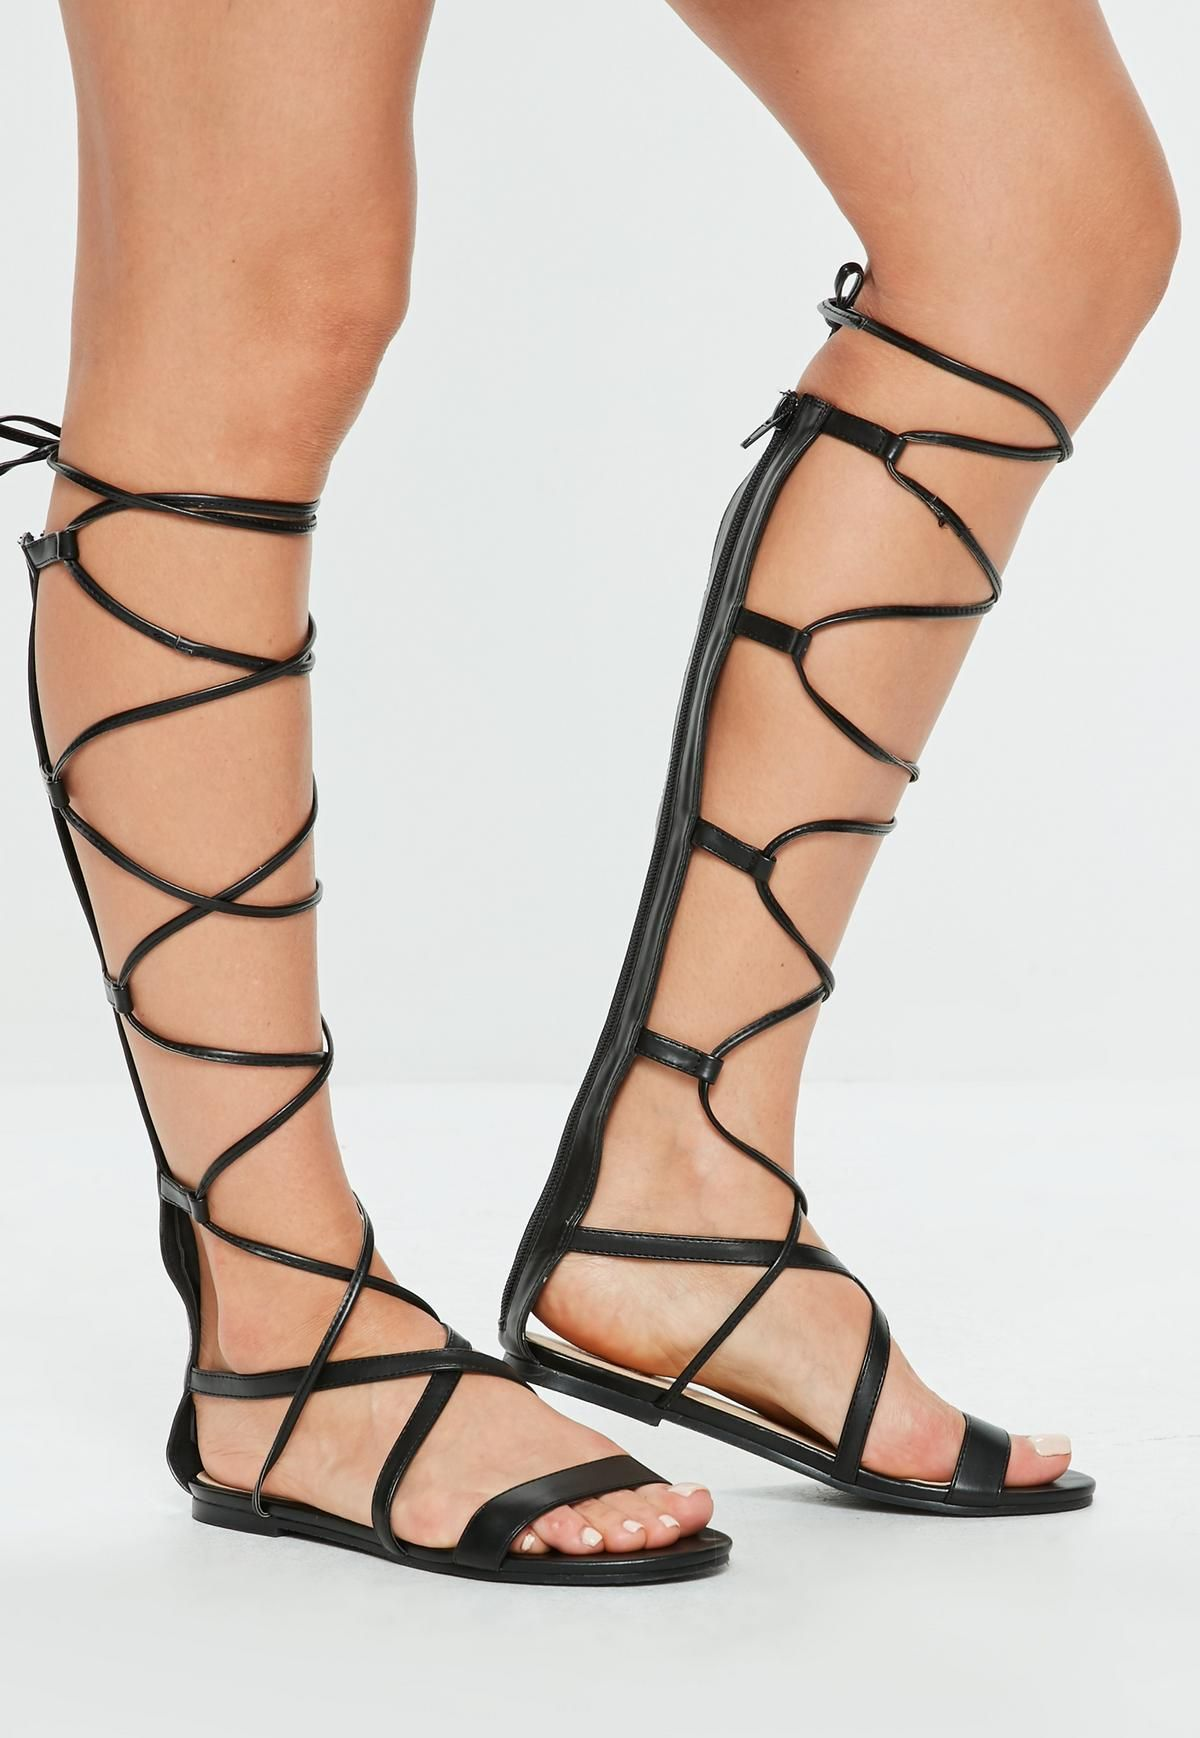 ed3edfc46d9a Black High Leg Gladiator Lace Up Flat Sandal